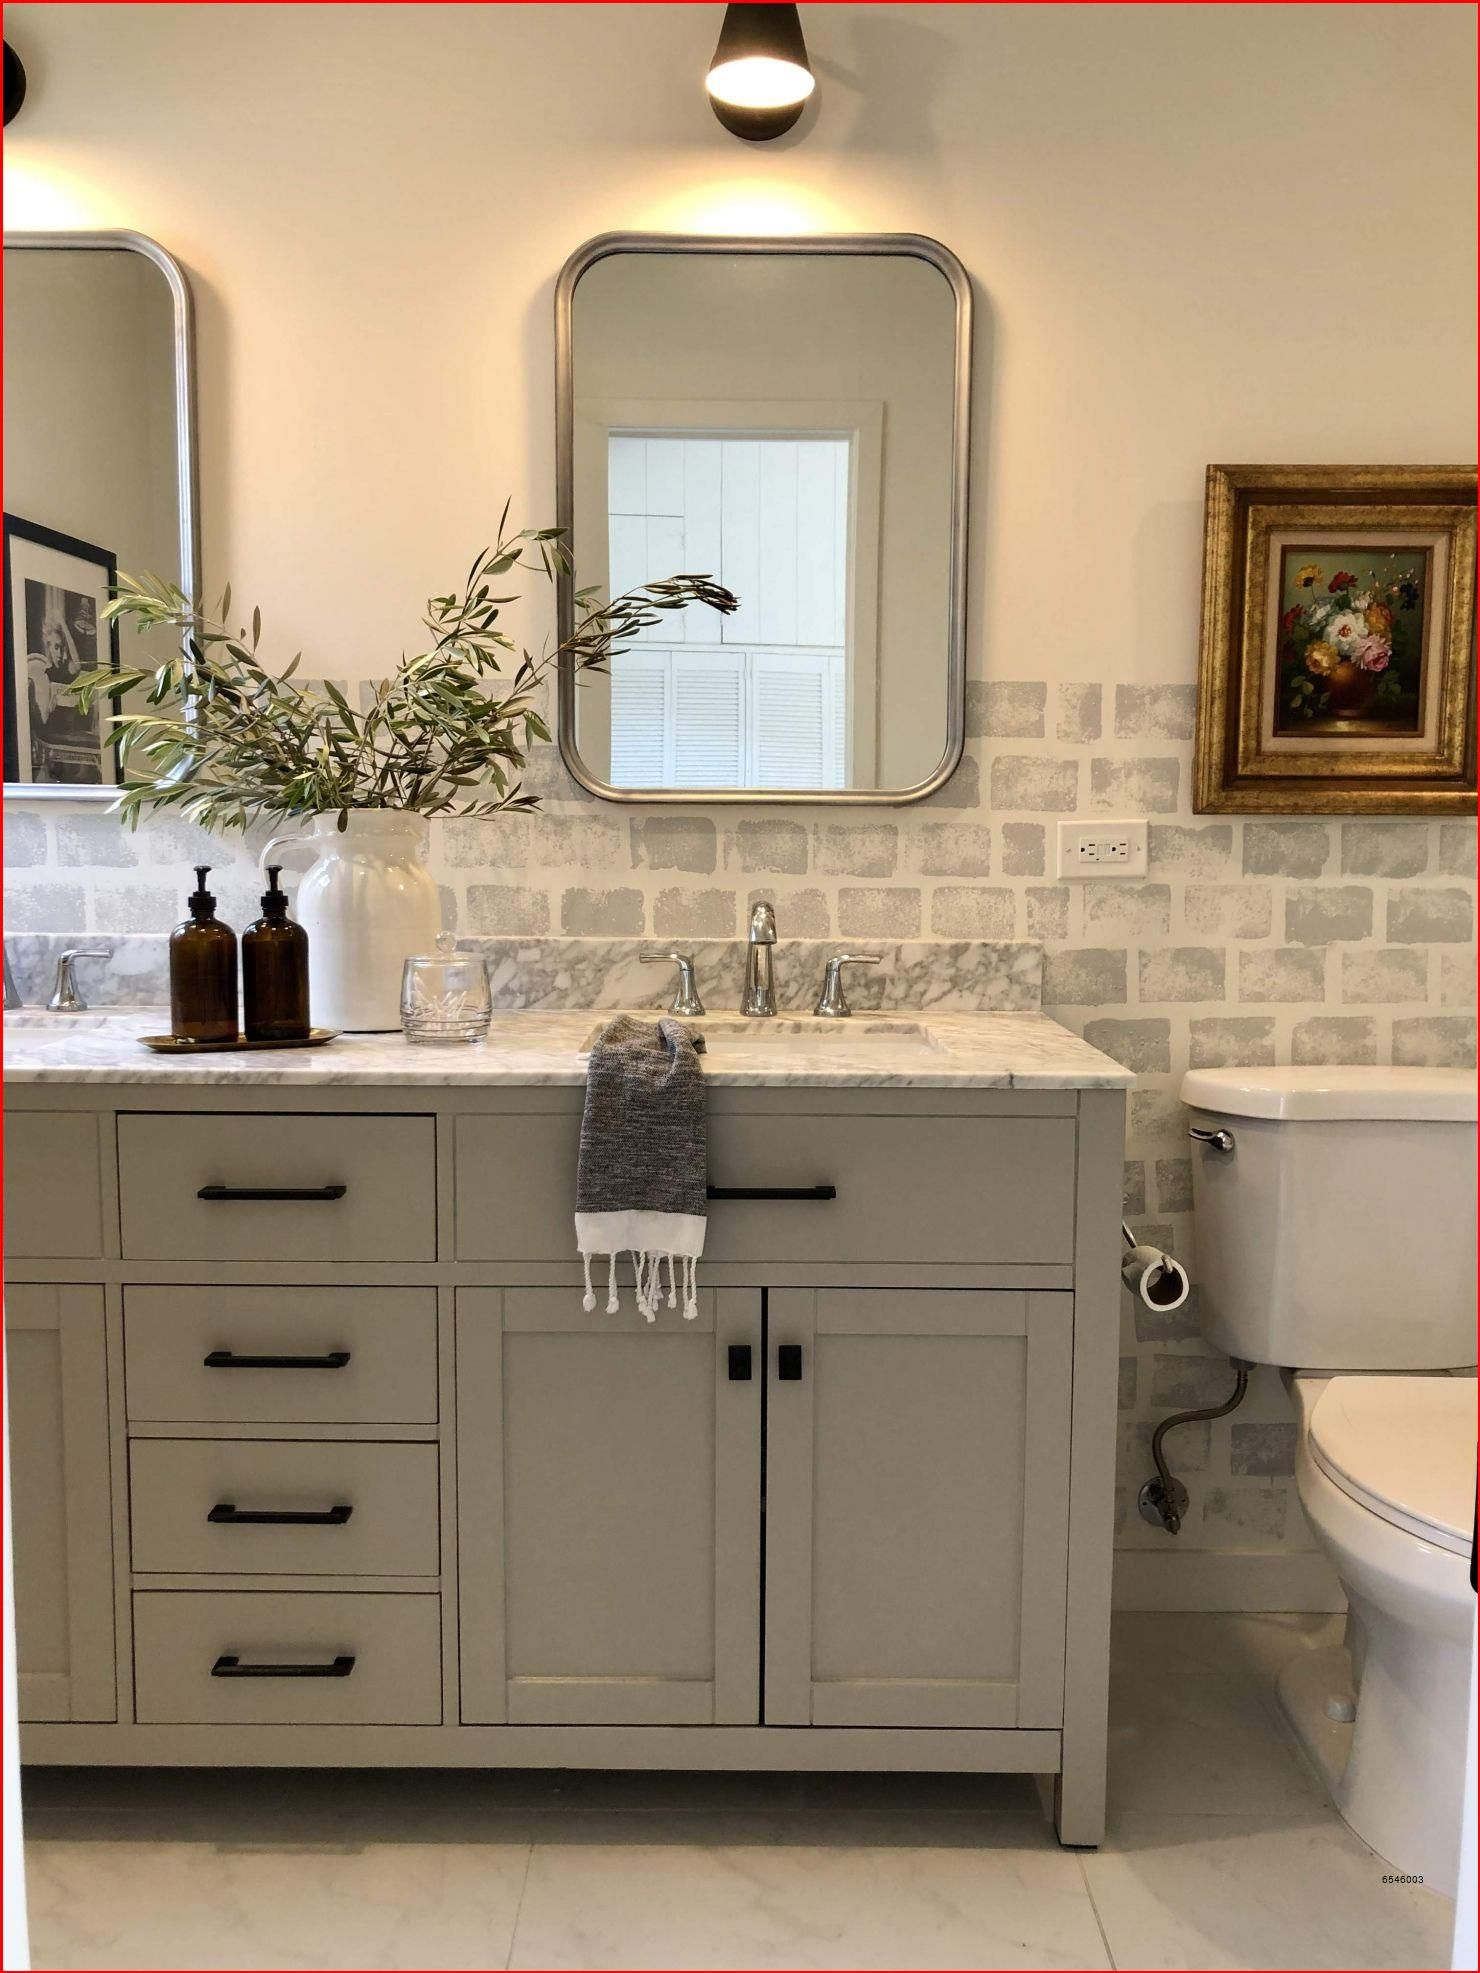 Bookcase Bookshelf Wooden Decorative Design Special Process Etsy Bathroom Cabinets Diy Diy Backsplash Diy Bathroom Durable paint for bathrooms